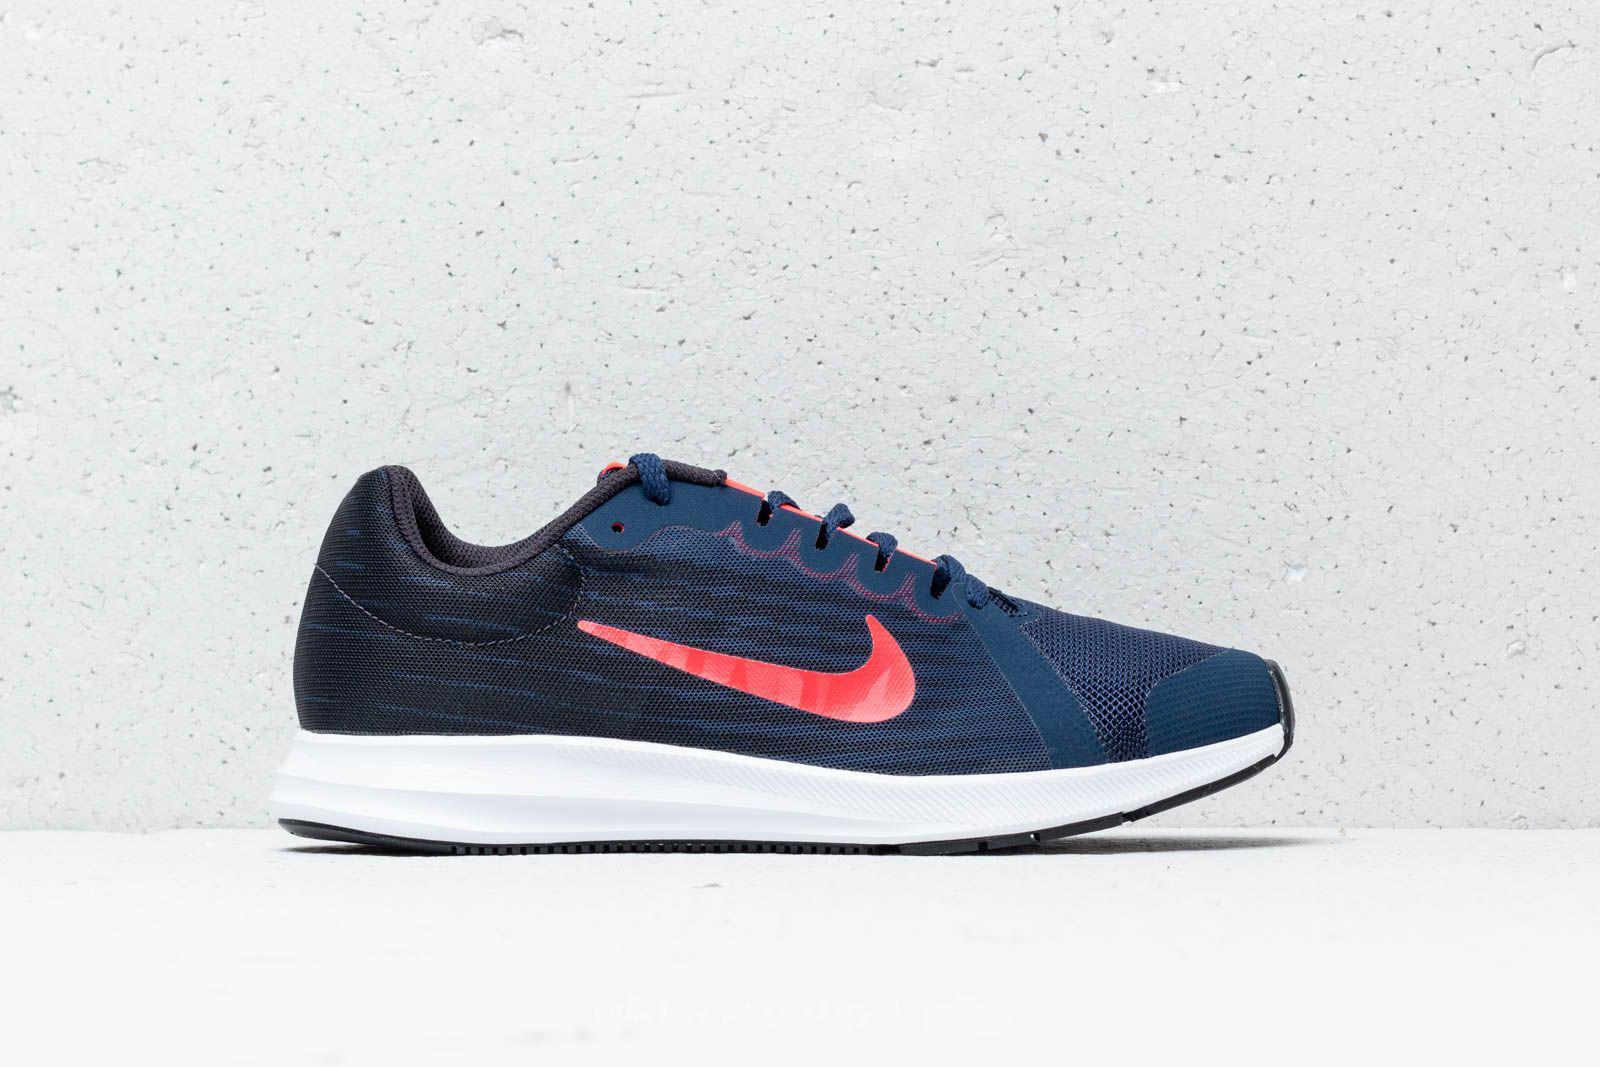 e0a99e7c3a08 Nike Running Shoes 7 Downshifter Flipkart Mens Tyiryq